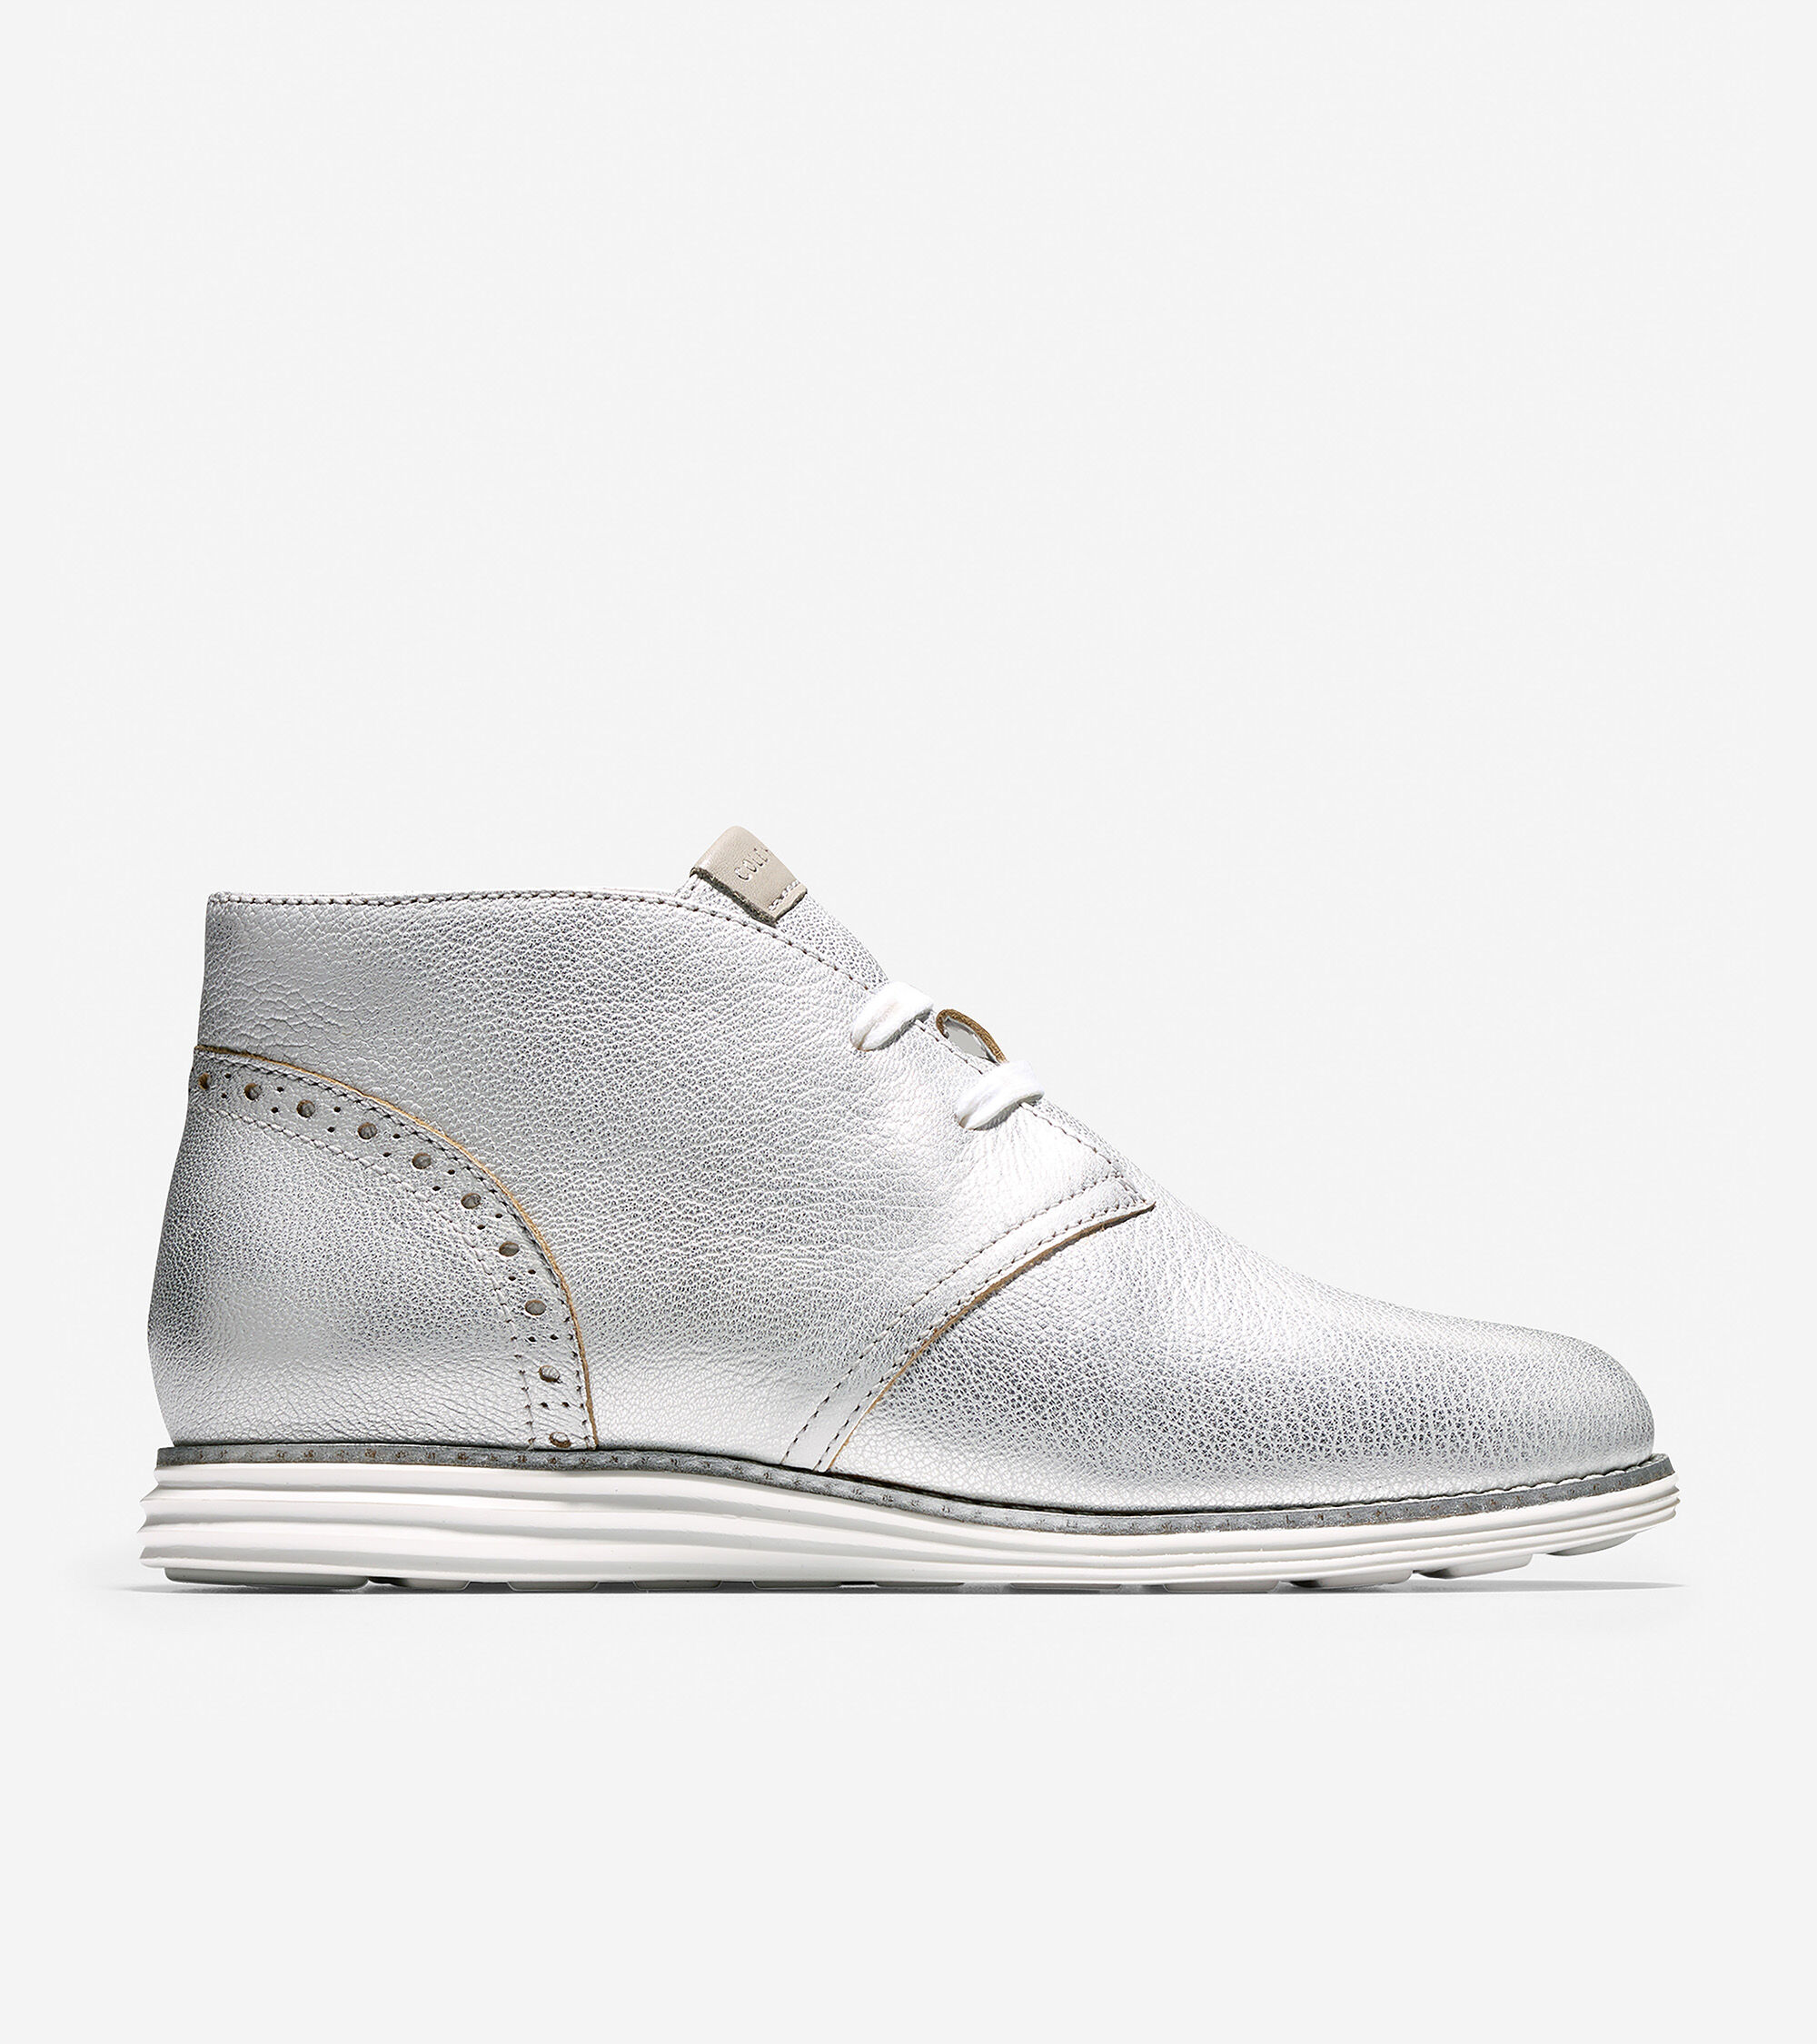 Cole Haan Womens OriginalGrand Chukka Bootss